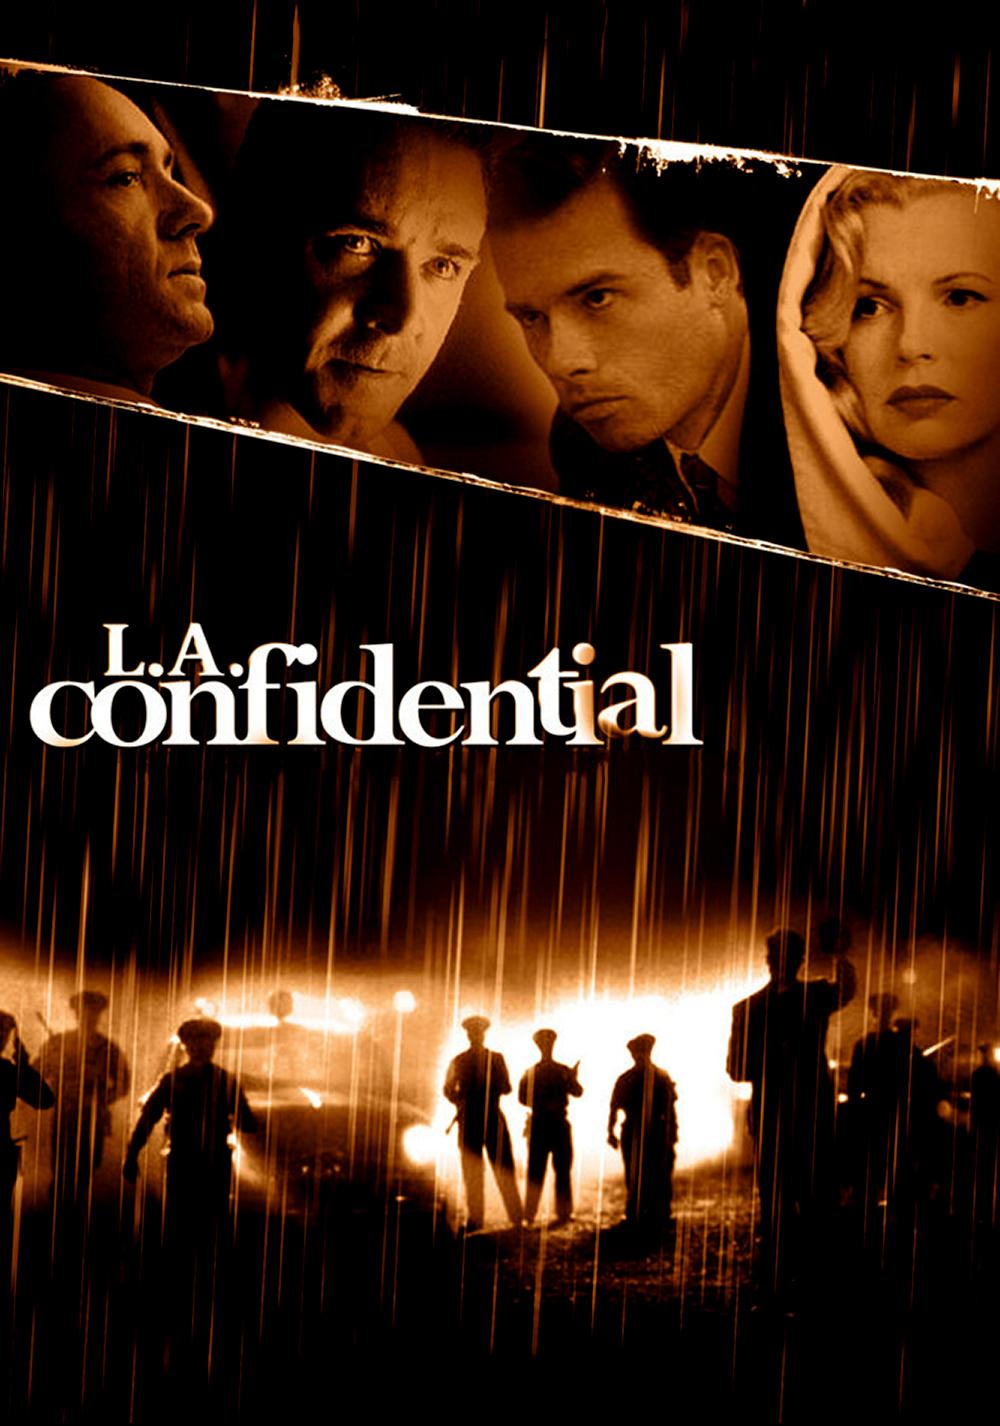 مشاهدة وتحميل فيلم L A Confidential 1997 720p BluRay مترجم اون لاين